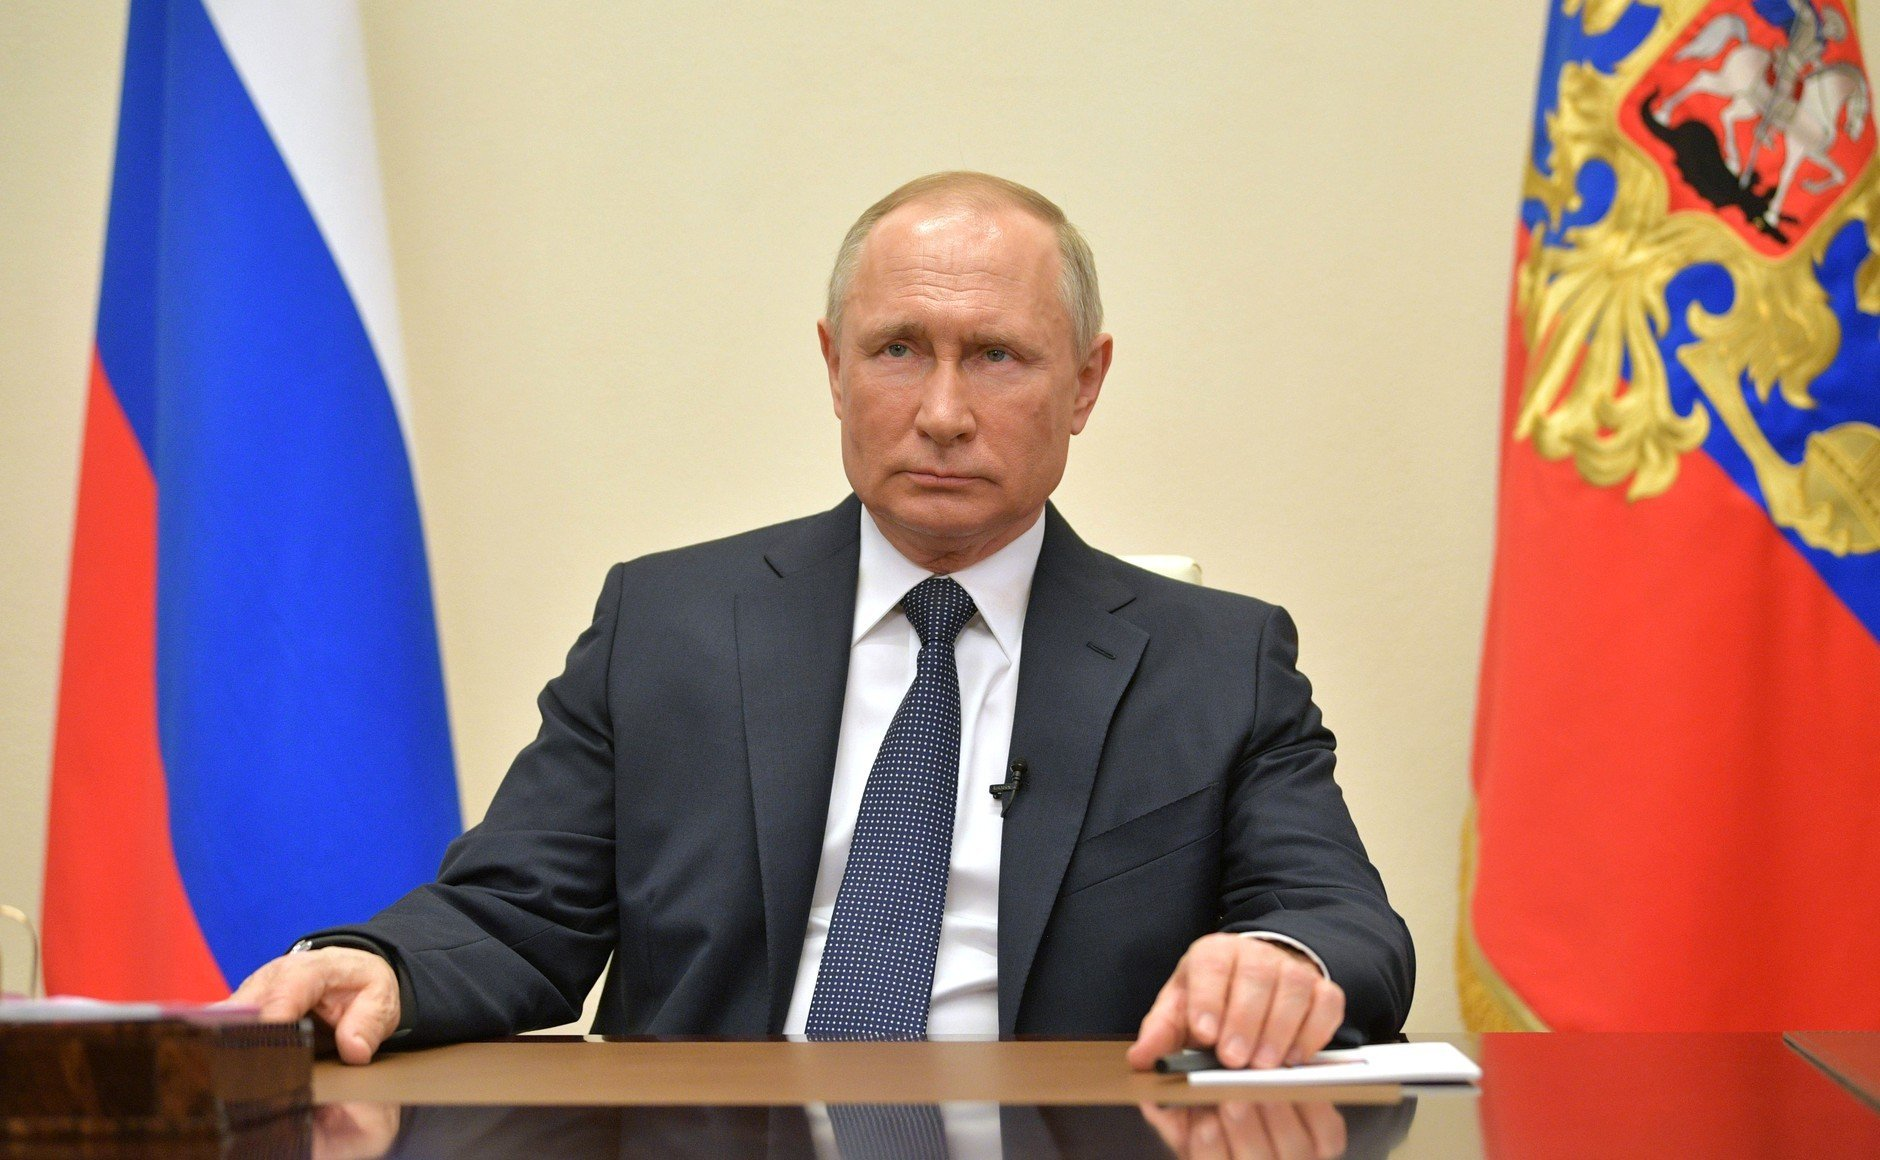 Listen: Russia Reacts to Biden's New Sanctions